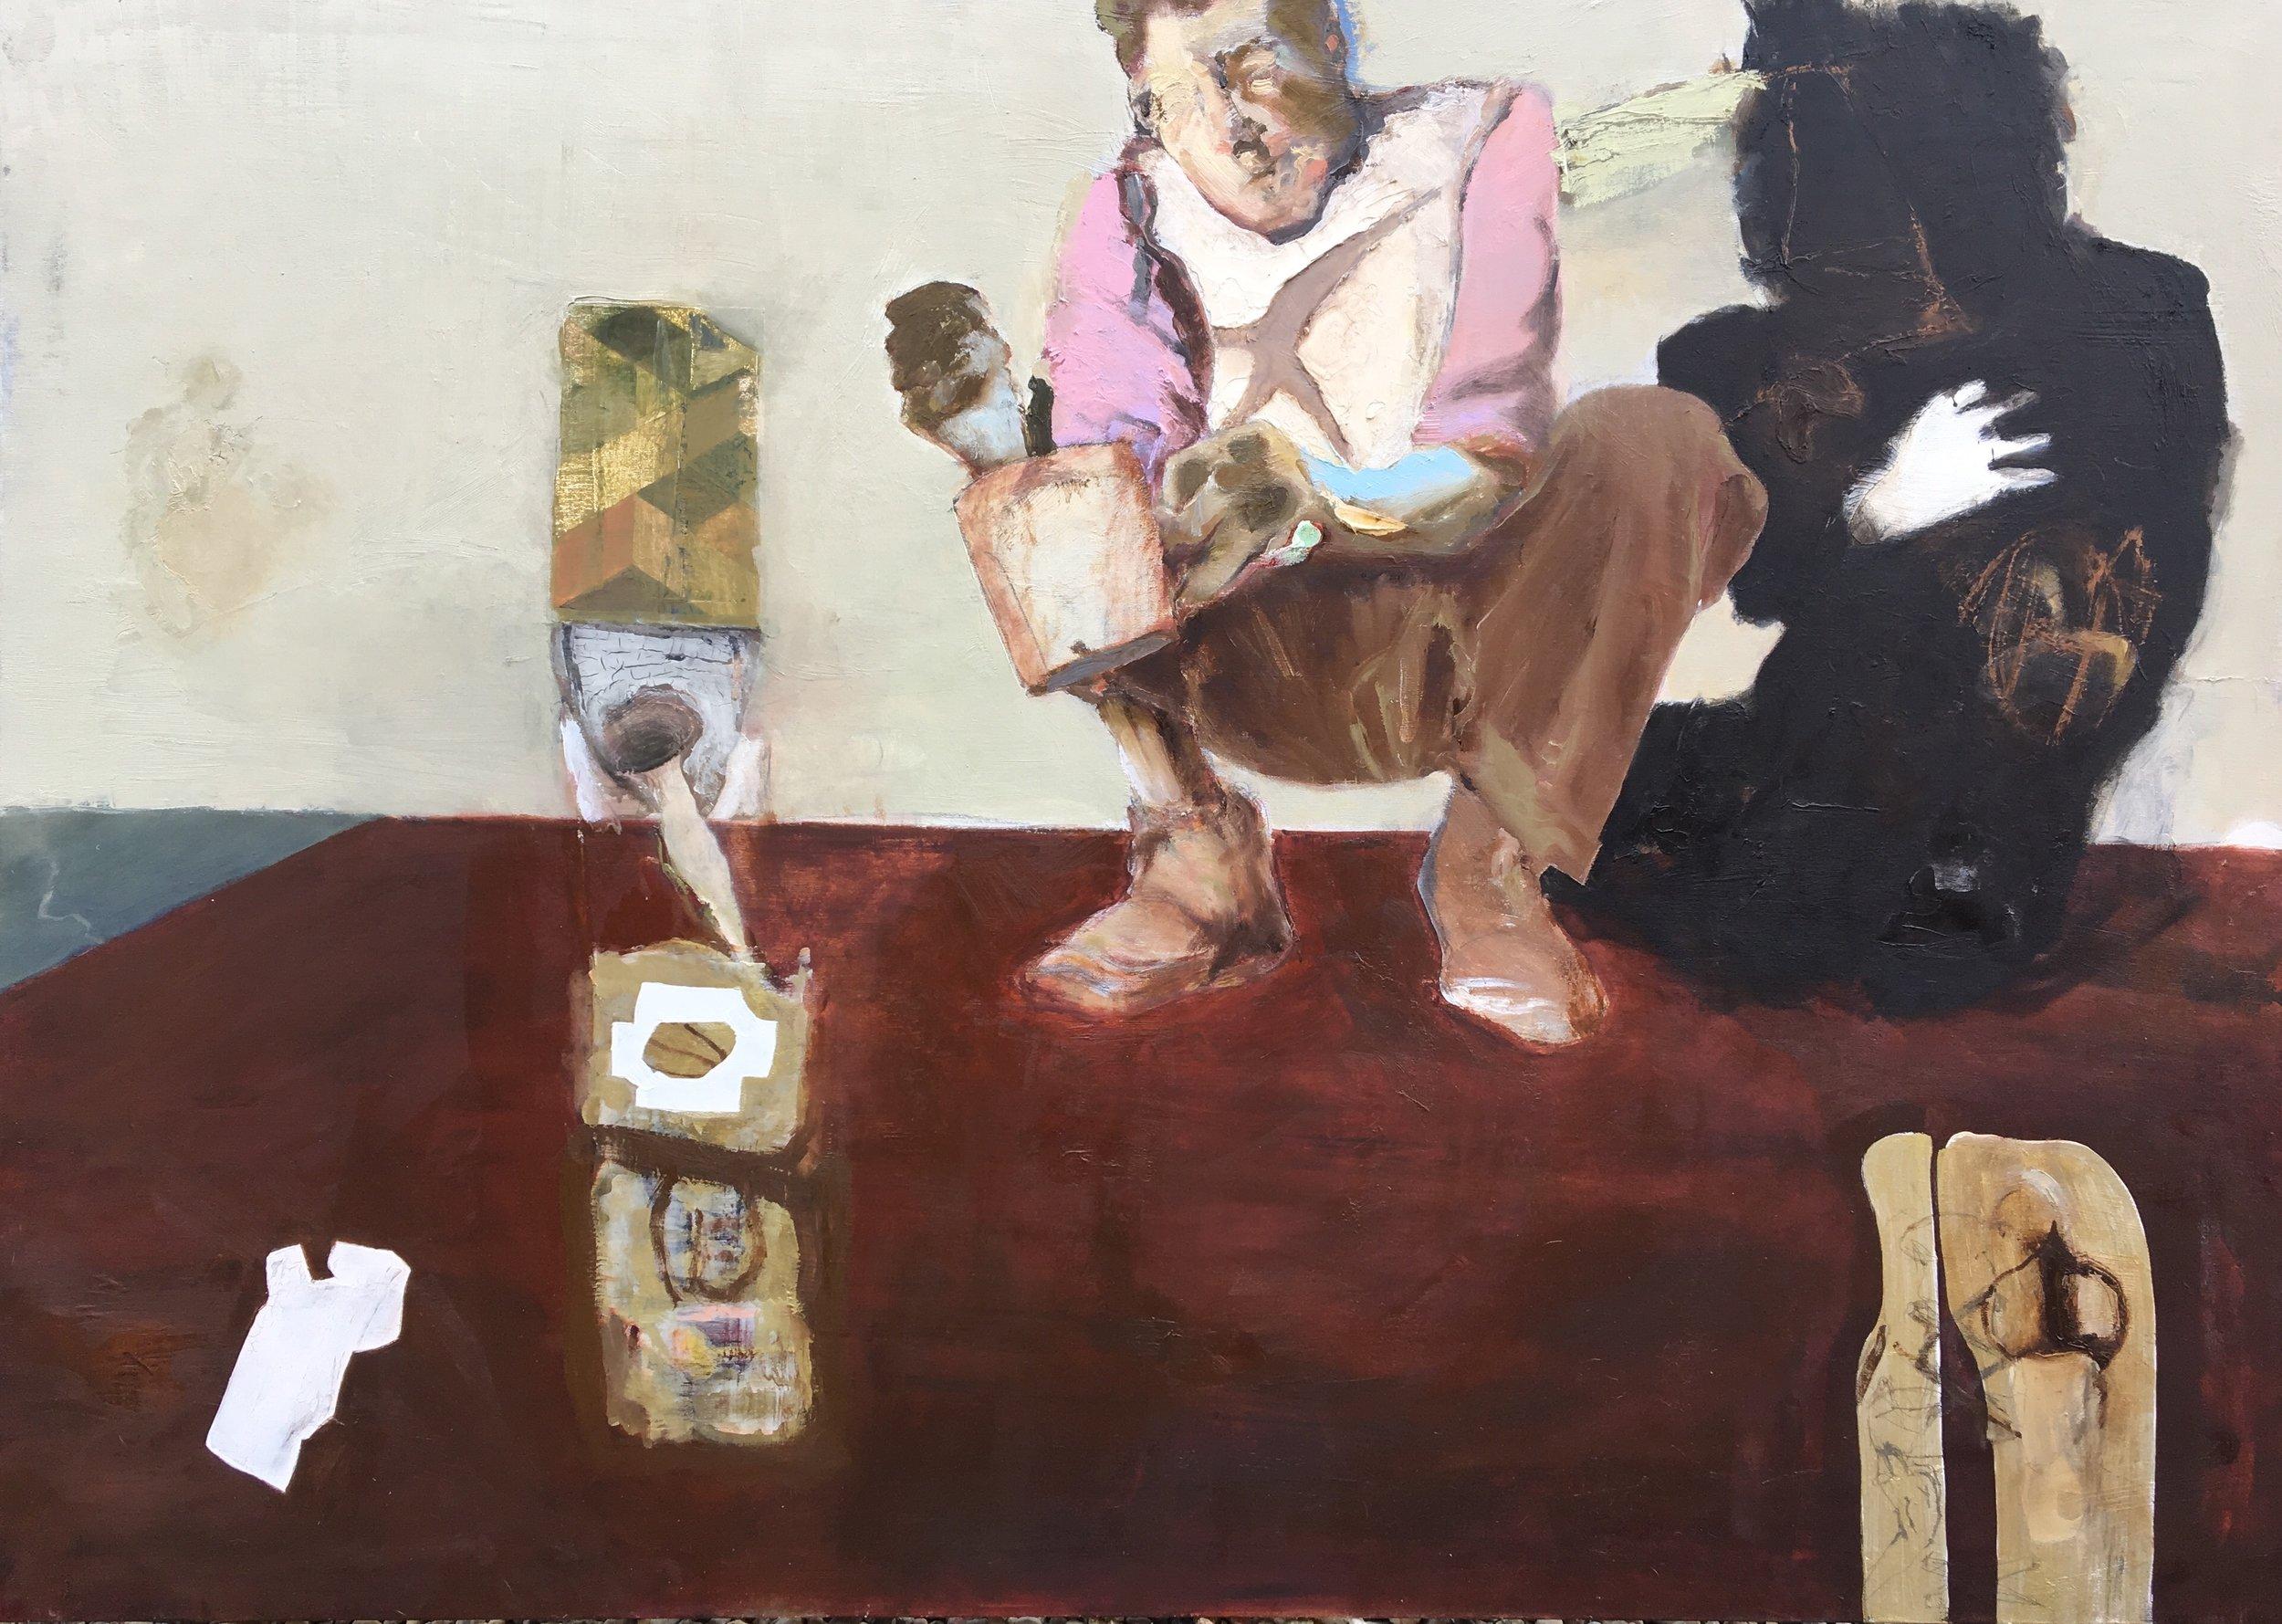 Honighocker, 2019, Öl/Acryl auf Leinwand, 100 x 140 cm